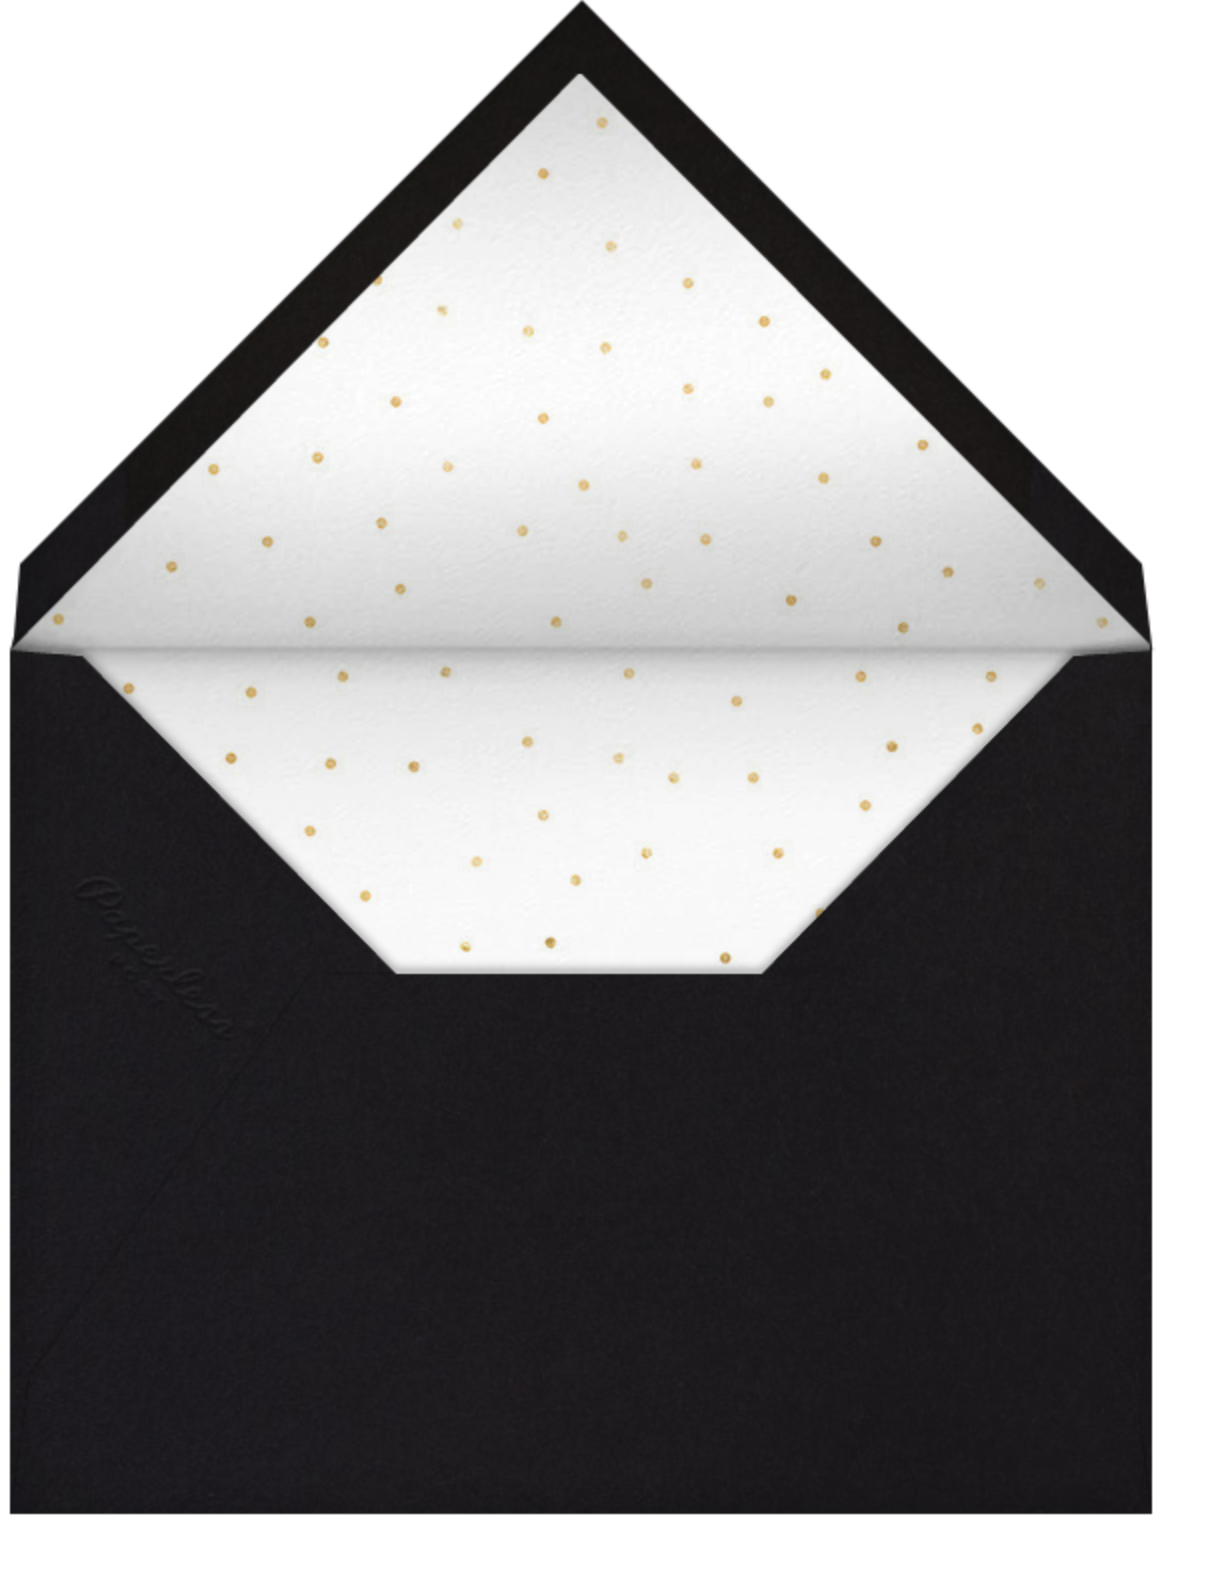 Hocus Pocus - White - Sugar Paper - Halloween - envelope back